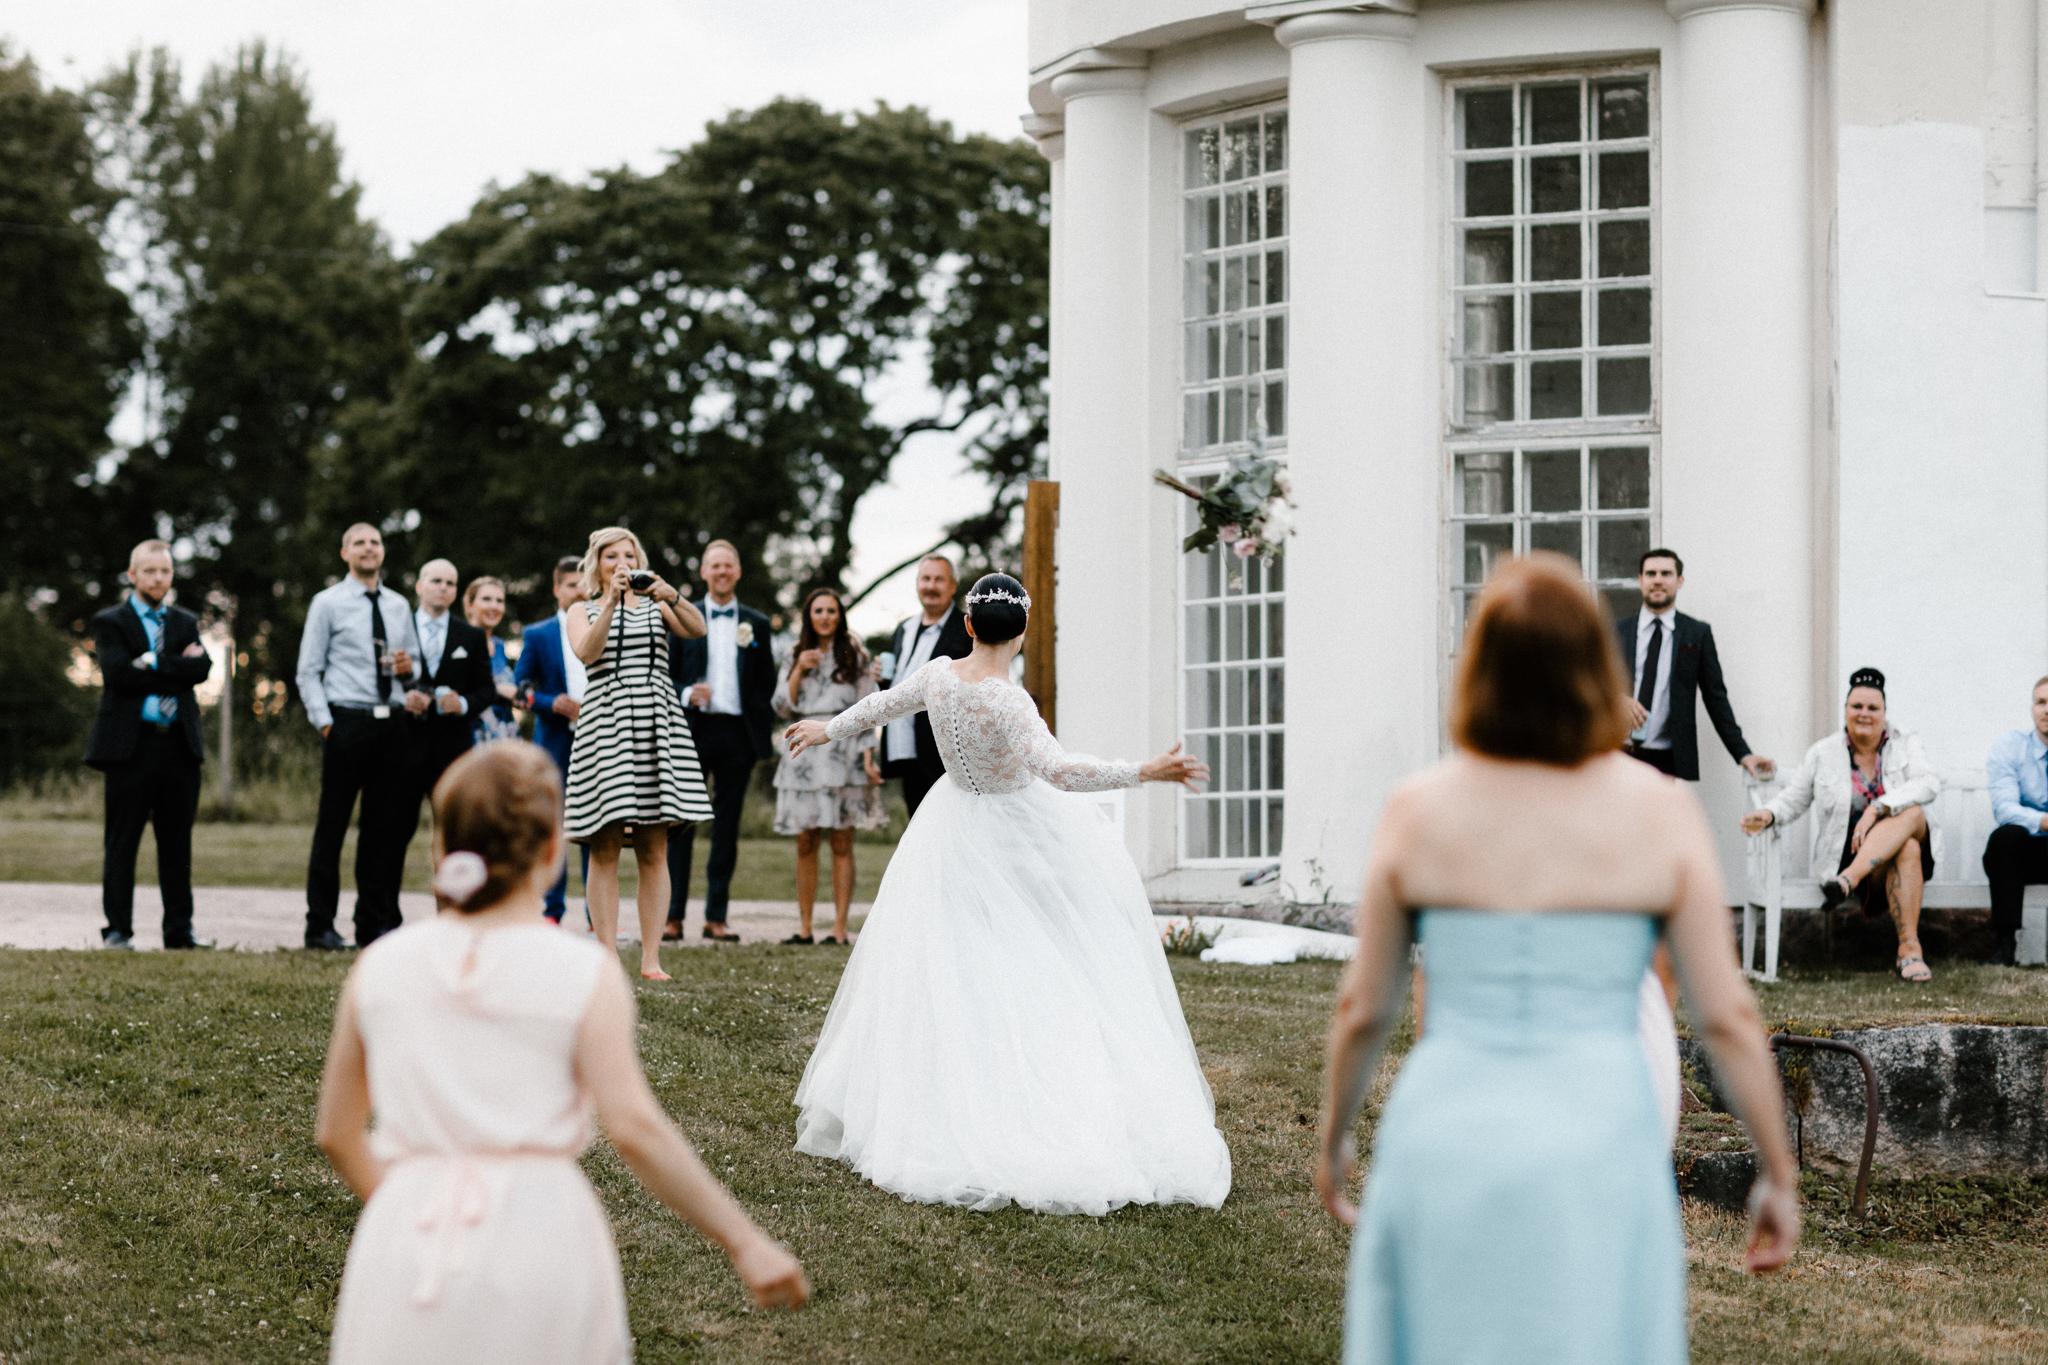 Essi + Ville   Oitbacka Gården   by Patrick Karkkolainen Wedding Photography-311.jpg